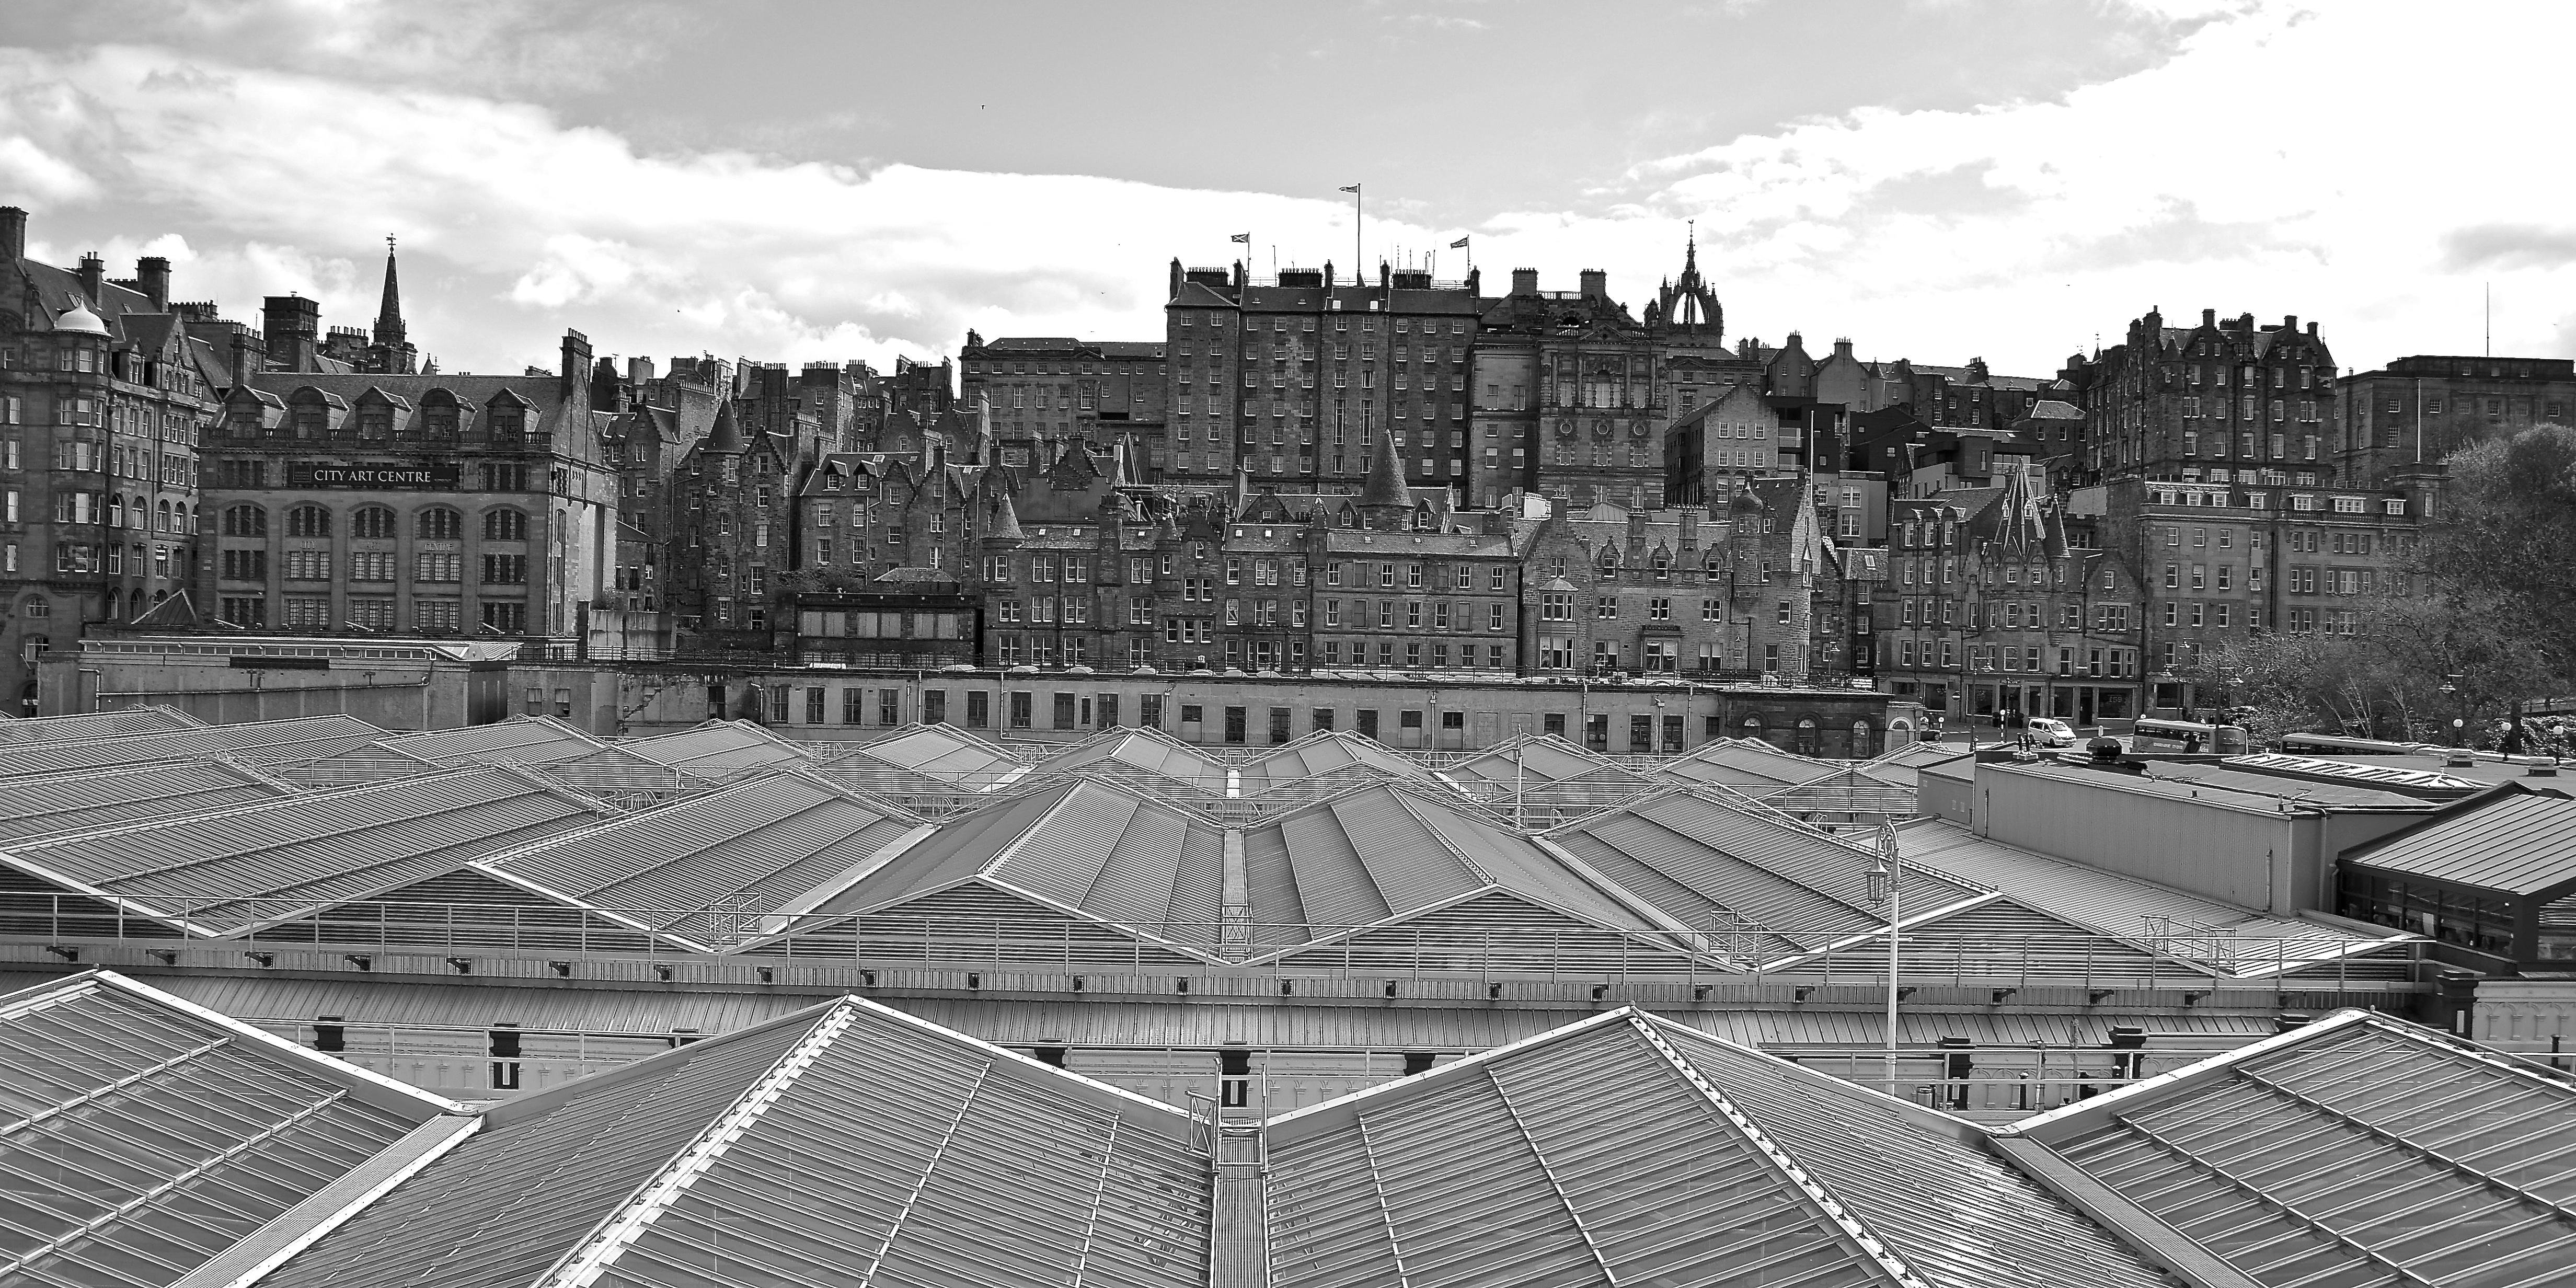 Old and New: Edinburgh Waverley